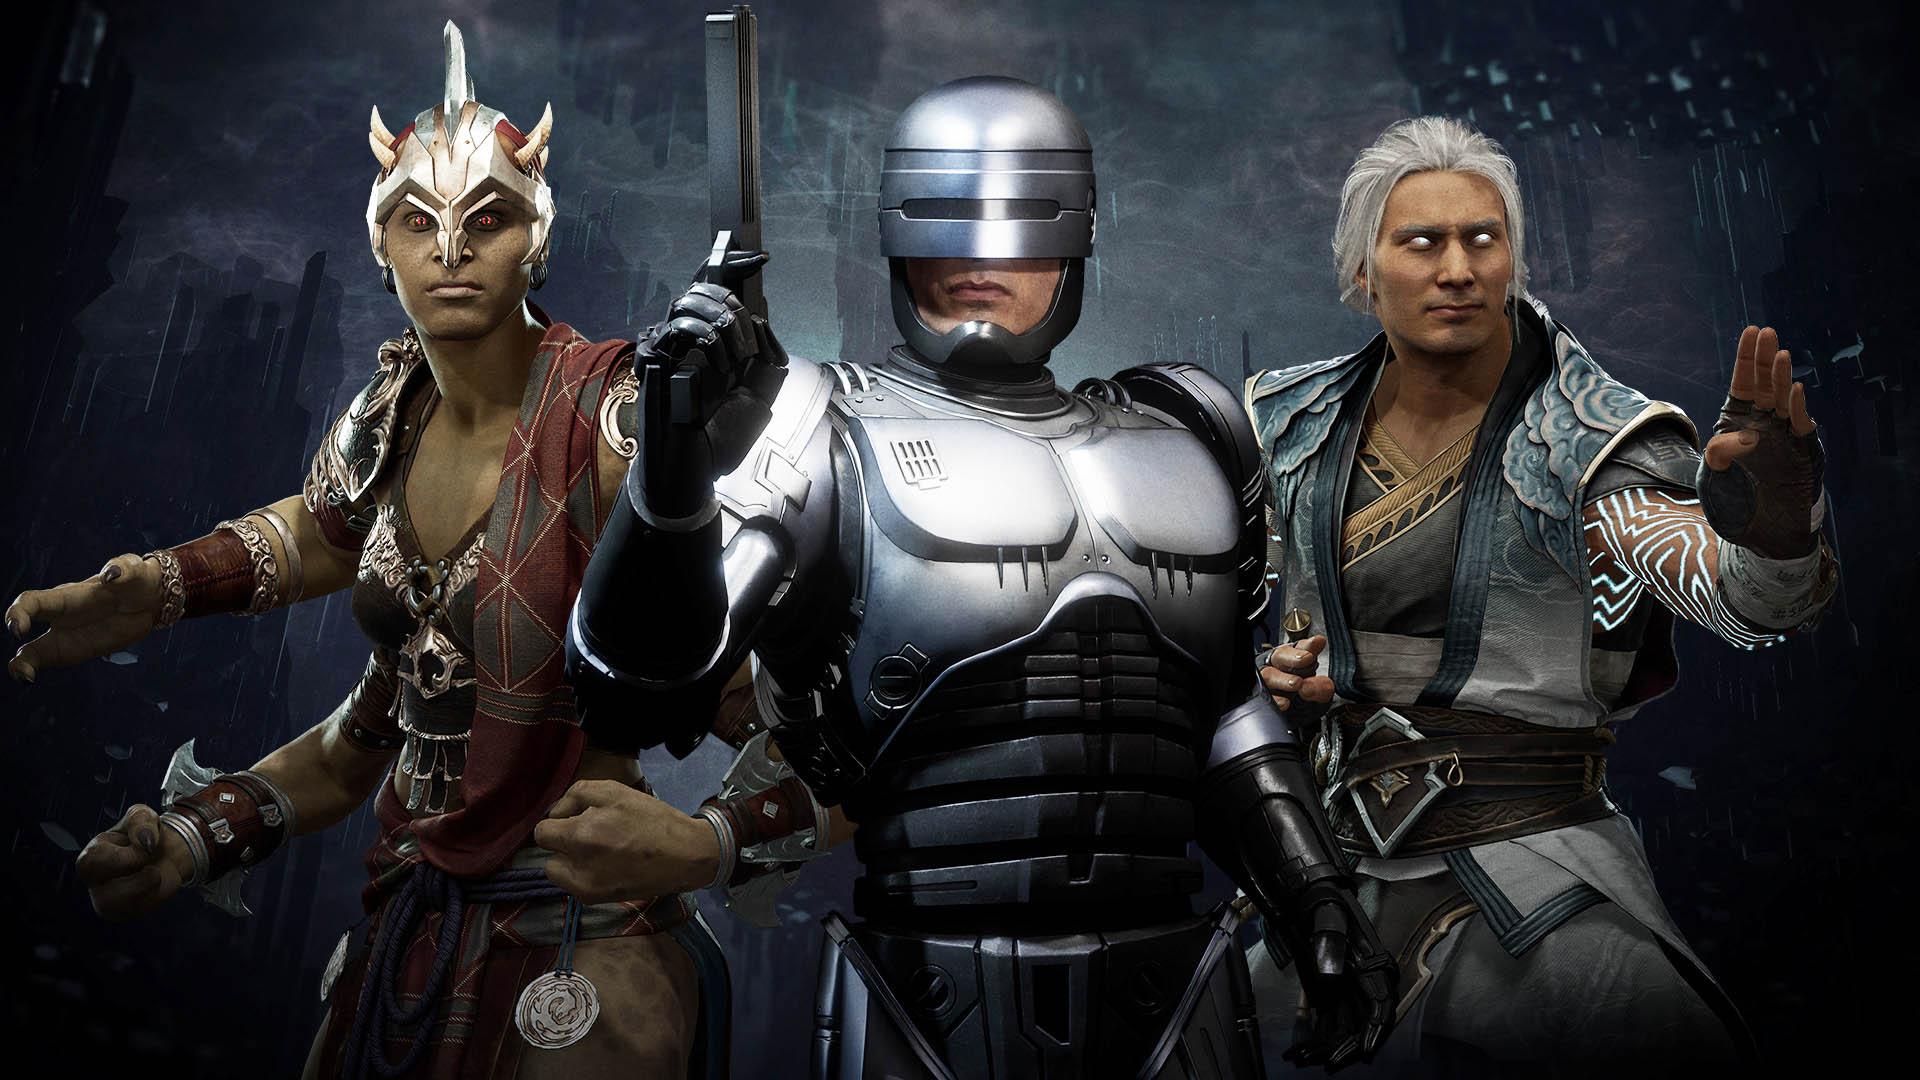 Mortal Kombat 11 Aftermath Announced By Warner Bros Bringing